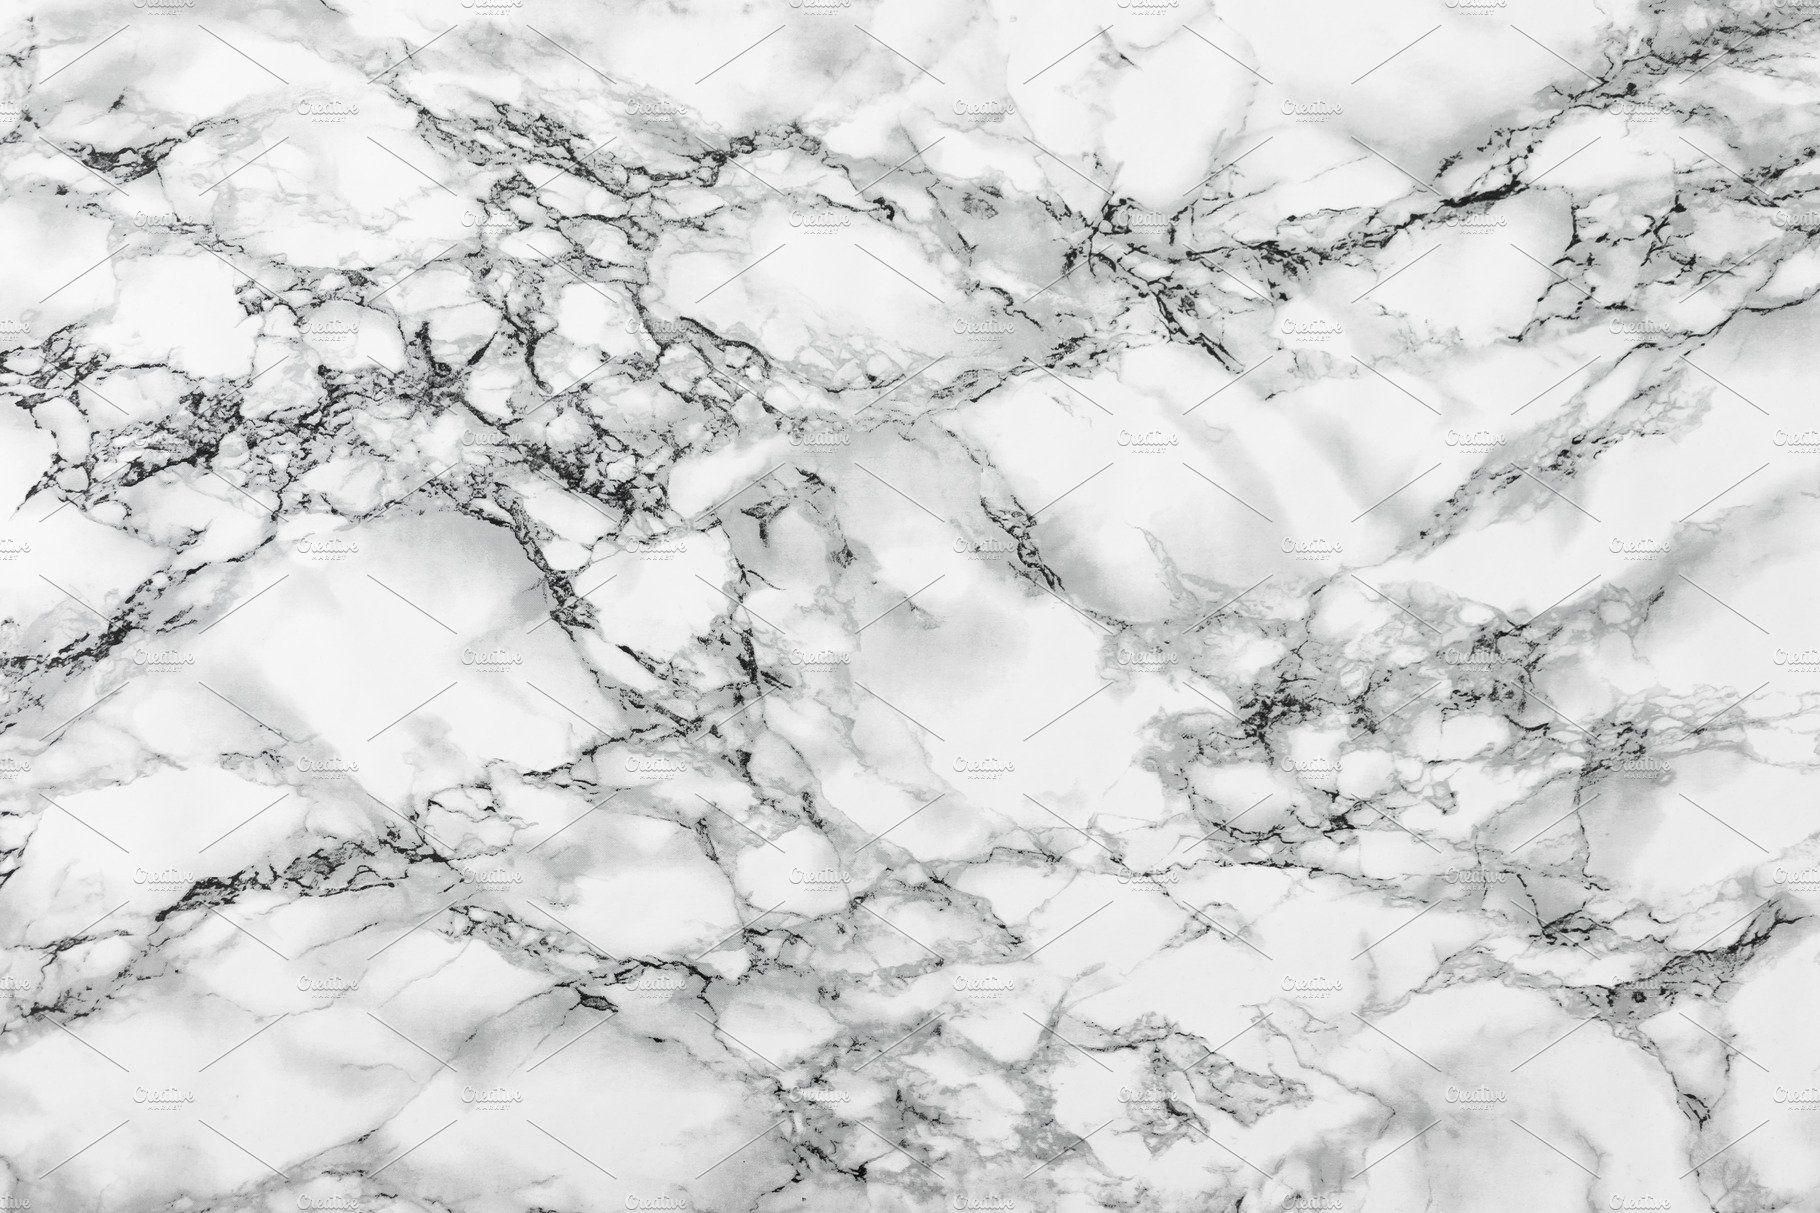 Black Marble Background Patter Black Marble Background Marble Background Aesthetic Desktop Wallpaper